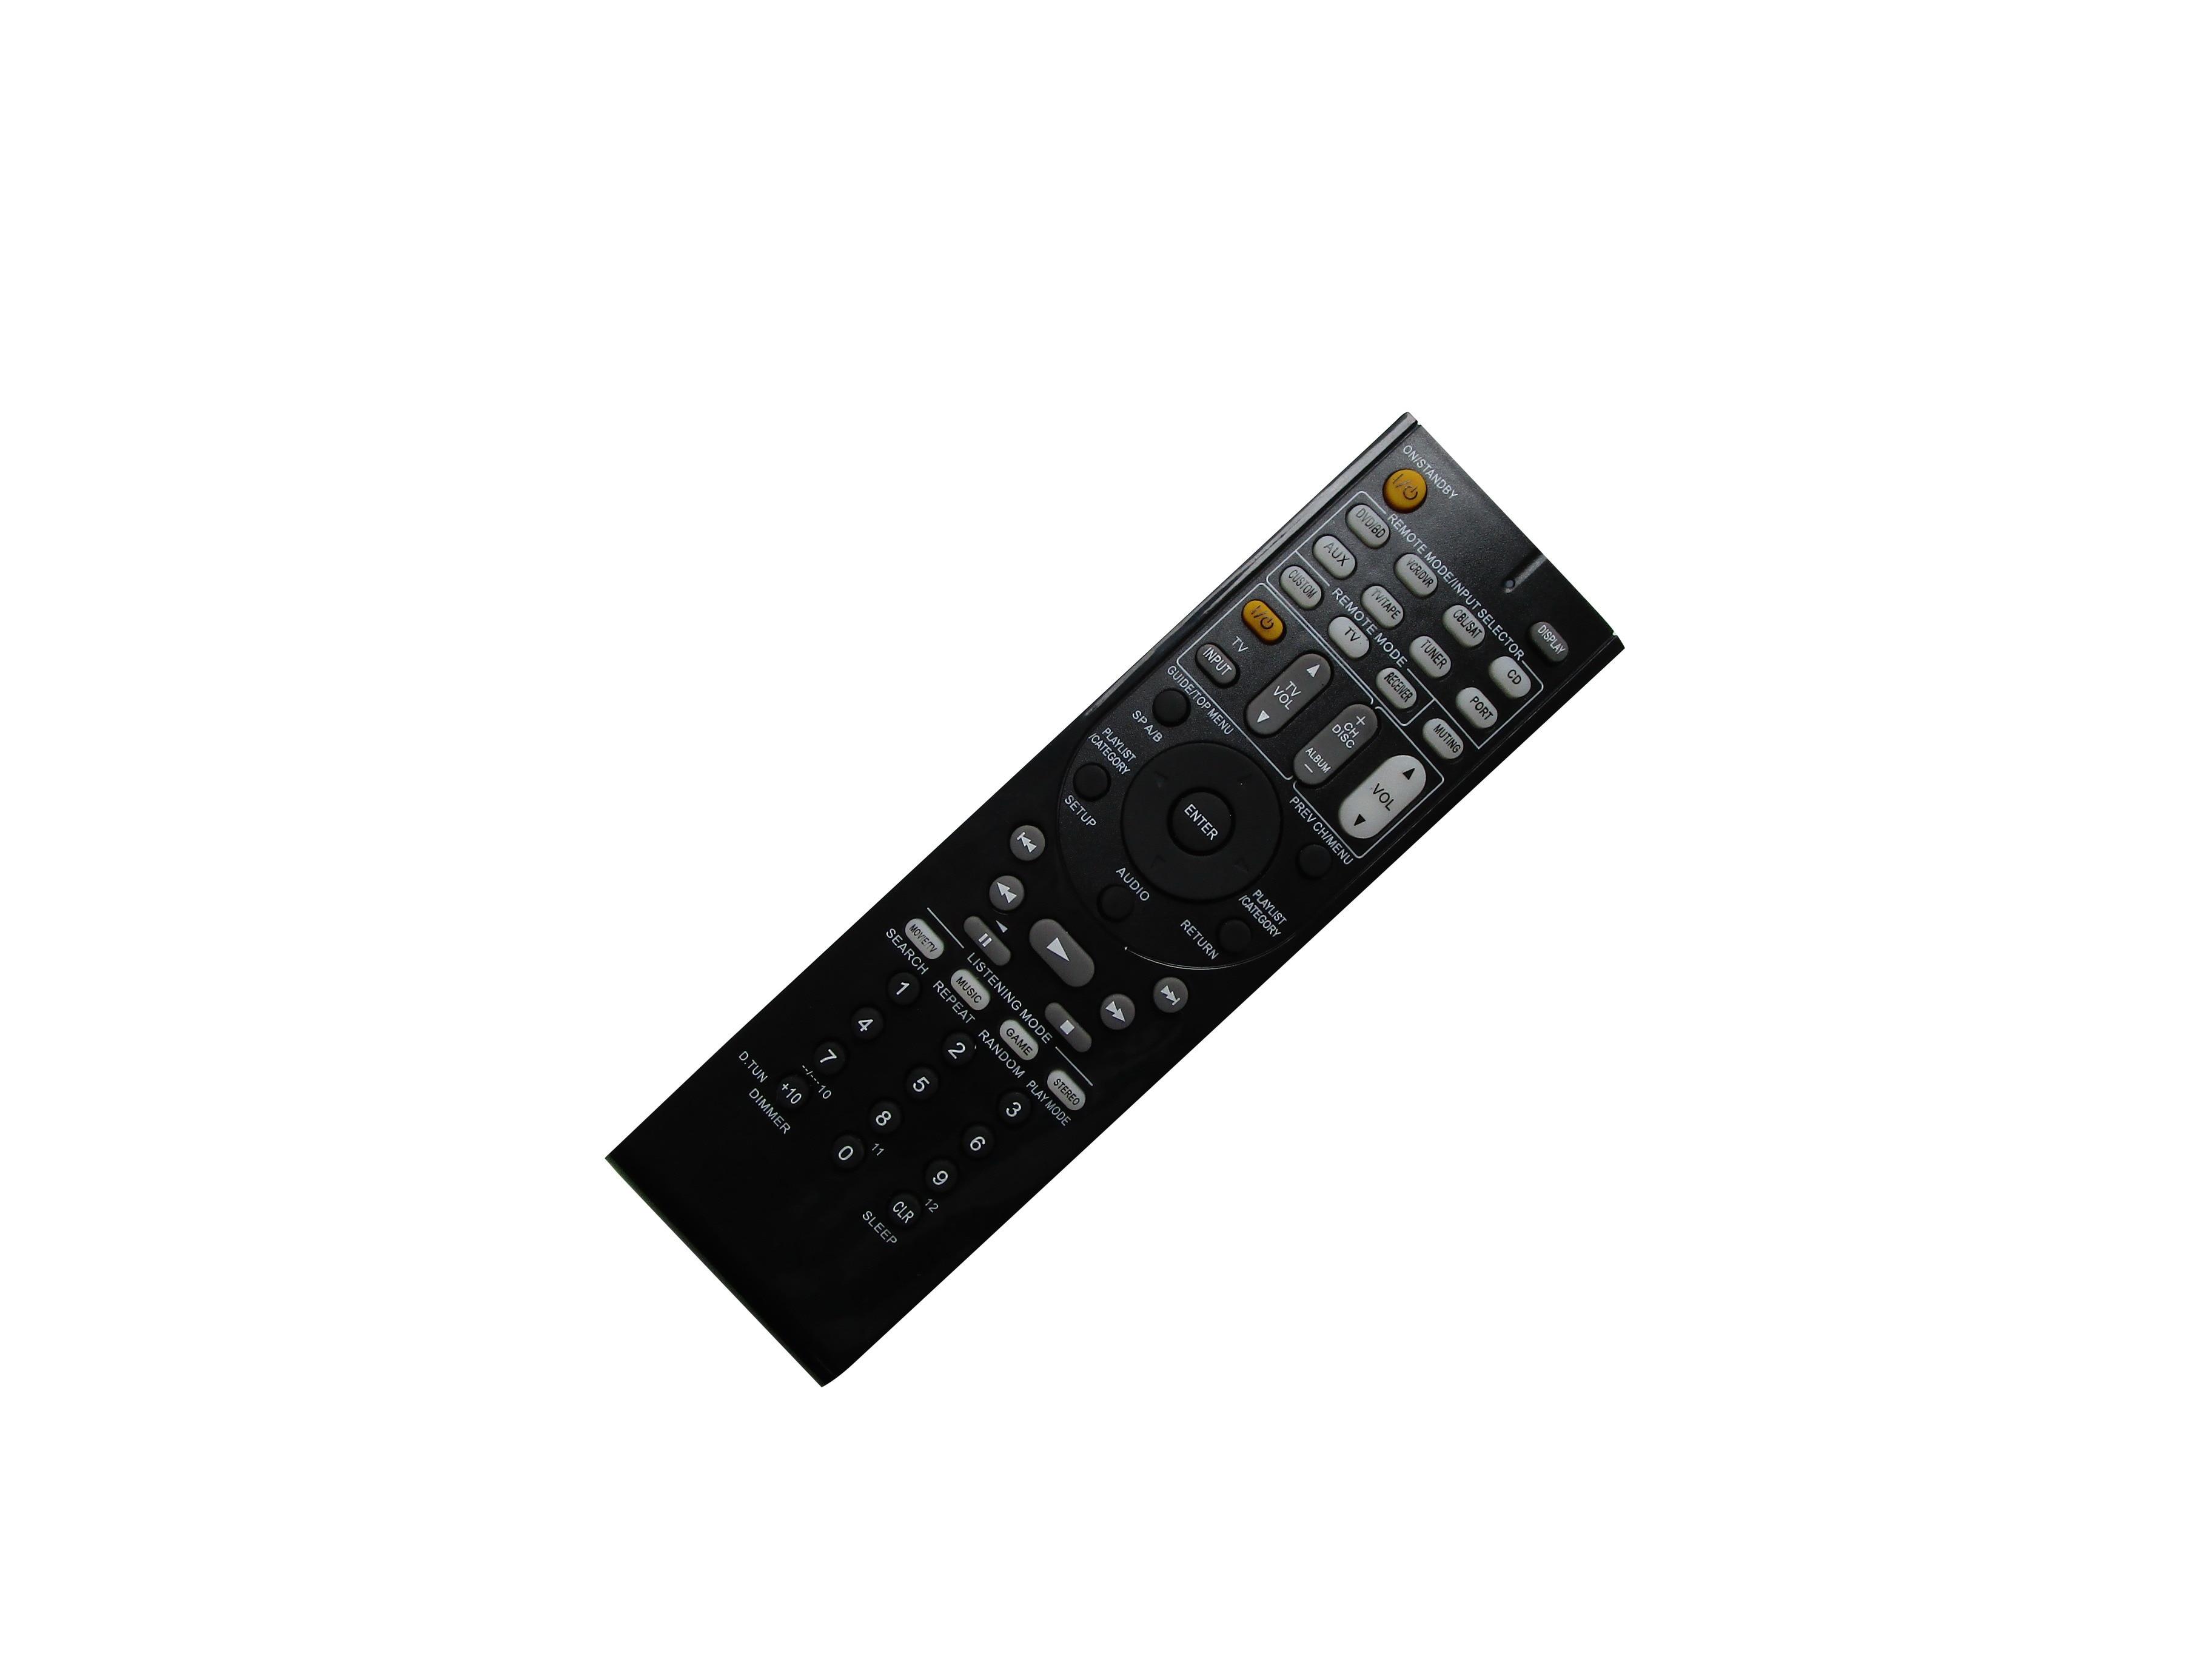 Control remoto para ONKYO HT-S7805 HT-S3800 HT-S5400 HT-RC330 HT-R591 HT-S5405 HT-S5405B HT-R548 HT-RC560 DVD sistema de cine en casa